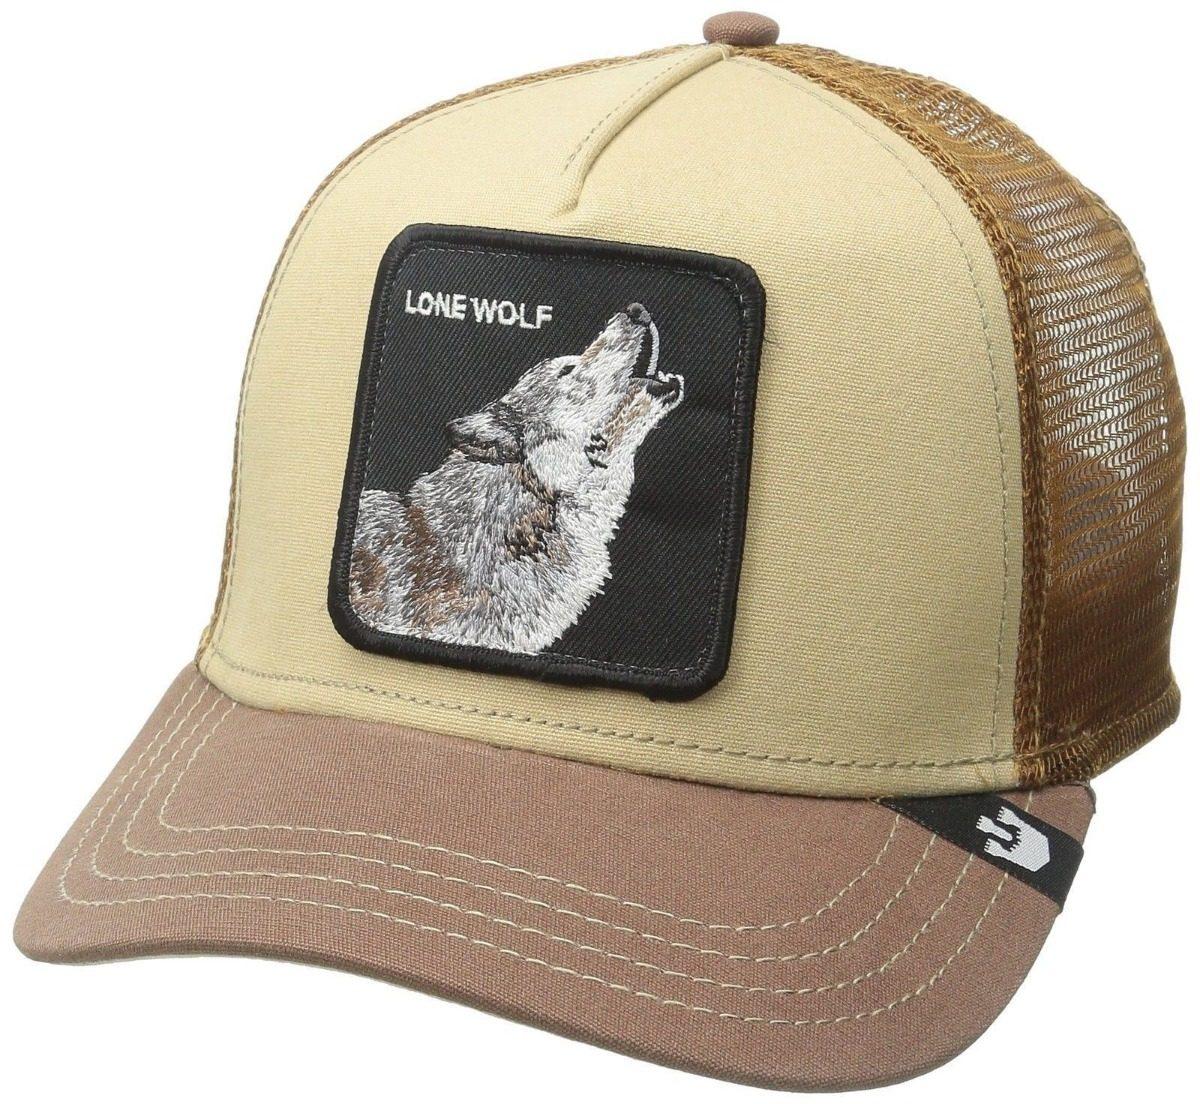 gorra goorin bros lone wolf brown - a pedido exkarg. Cargando zoom. 695a26780ef